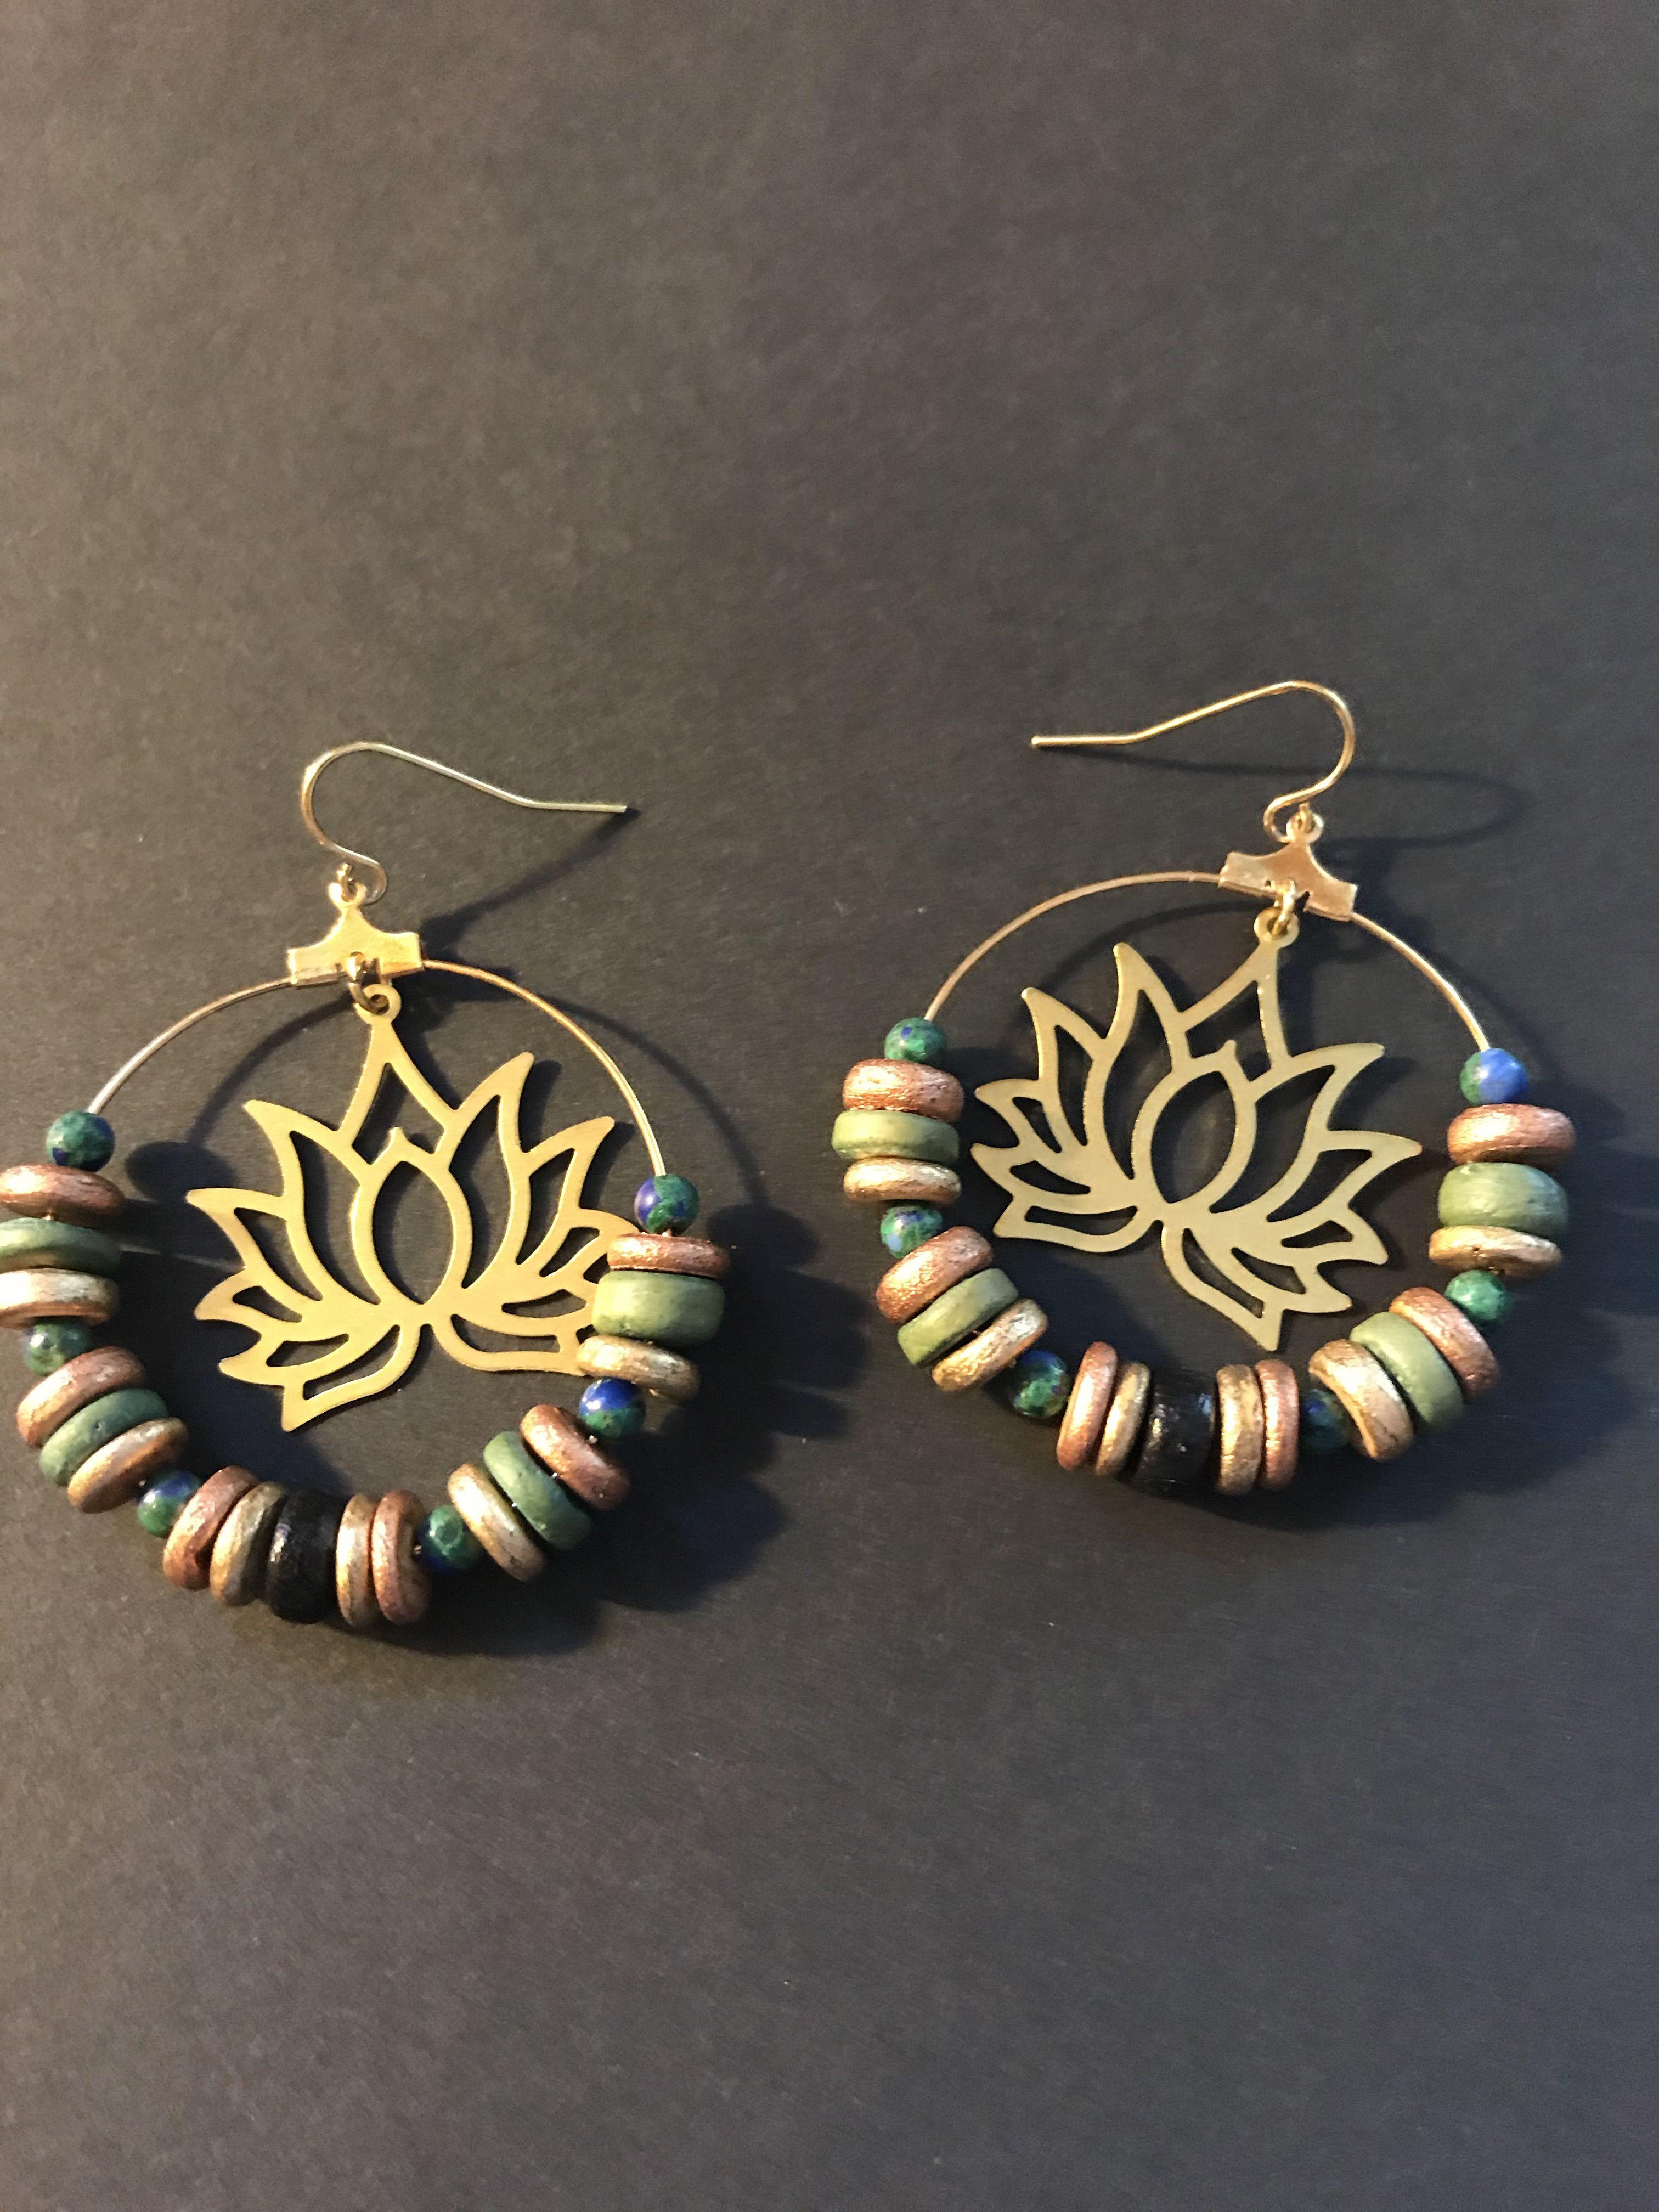 Nature Inspired Dangle Earrings Drop Earrings,Brass Earrings Brass Leaf Earrings Mandala Drop Earrings Boho Style Handmade.